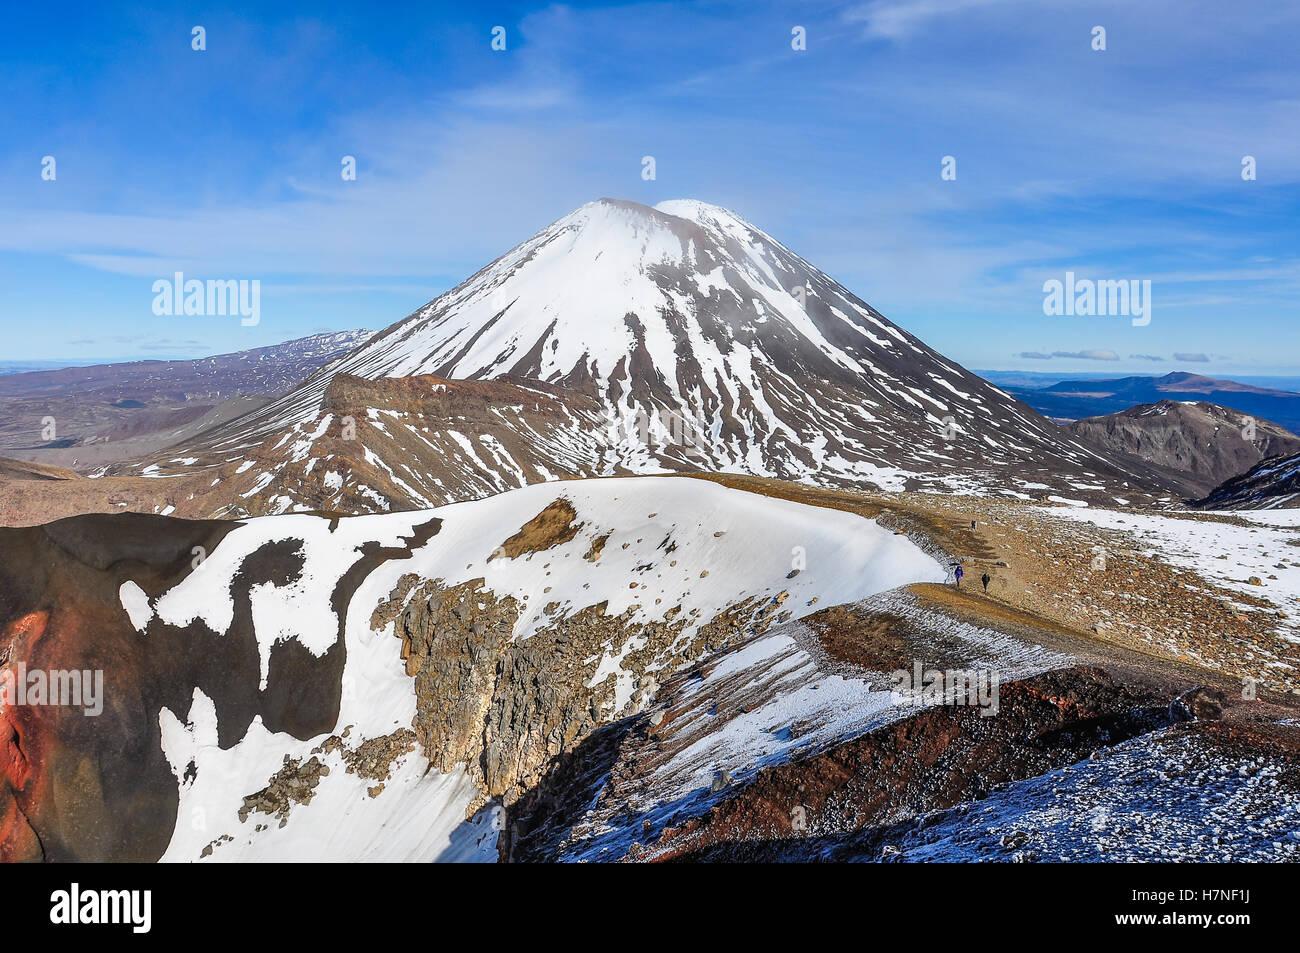 View of Mount Ngauruhoe in the winter Tongariro Alpine Crossing, New Zealand - Stock Image